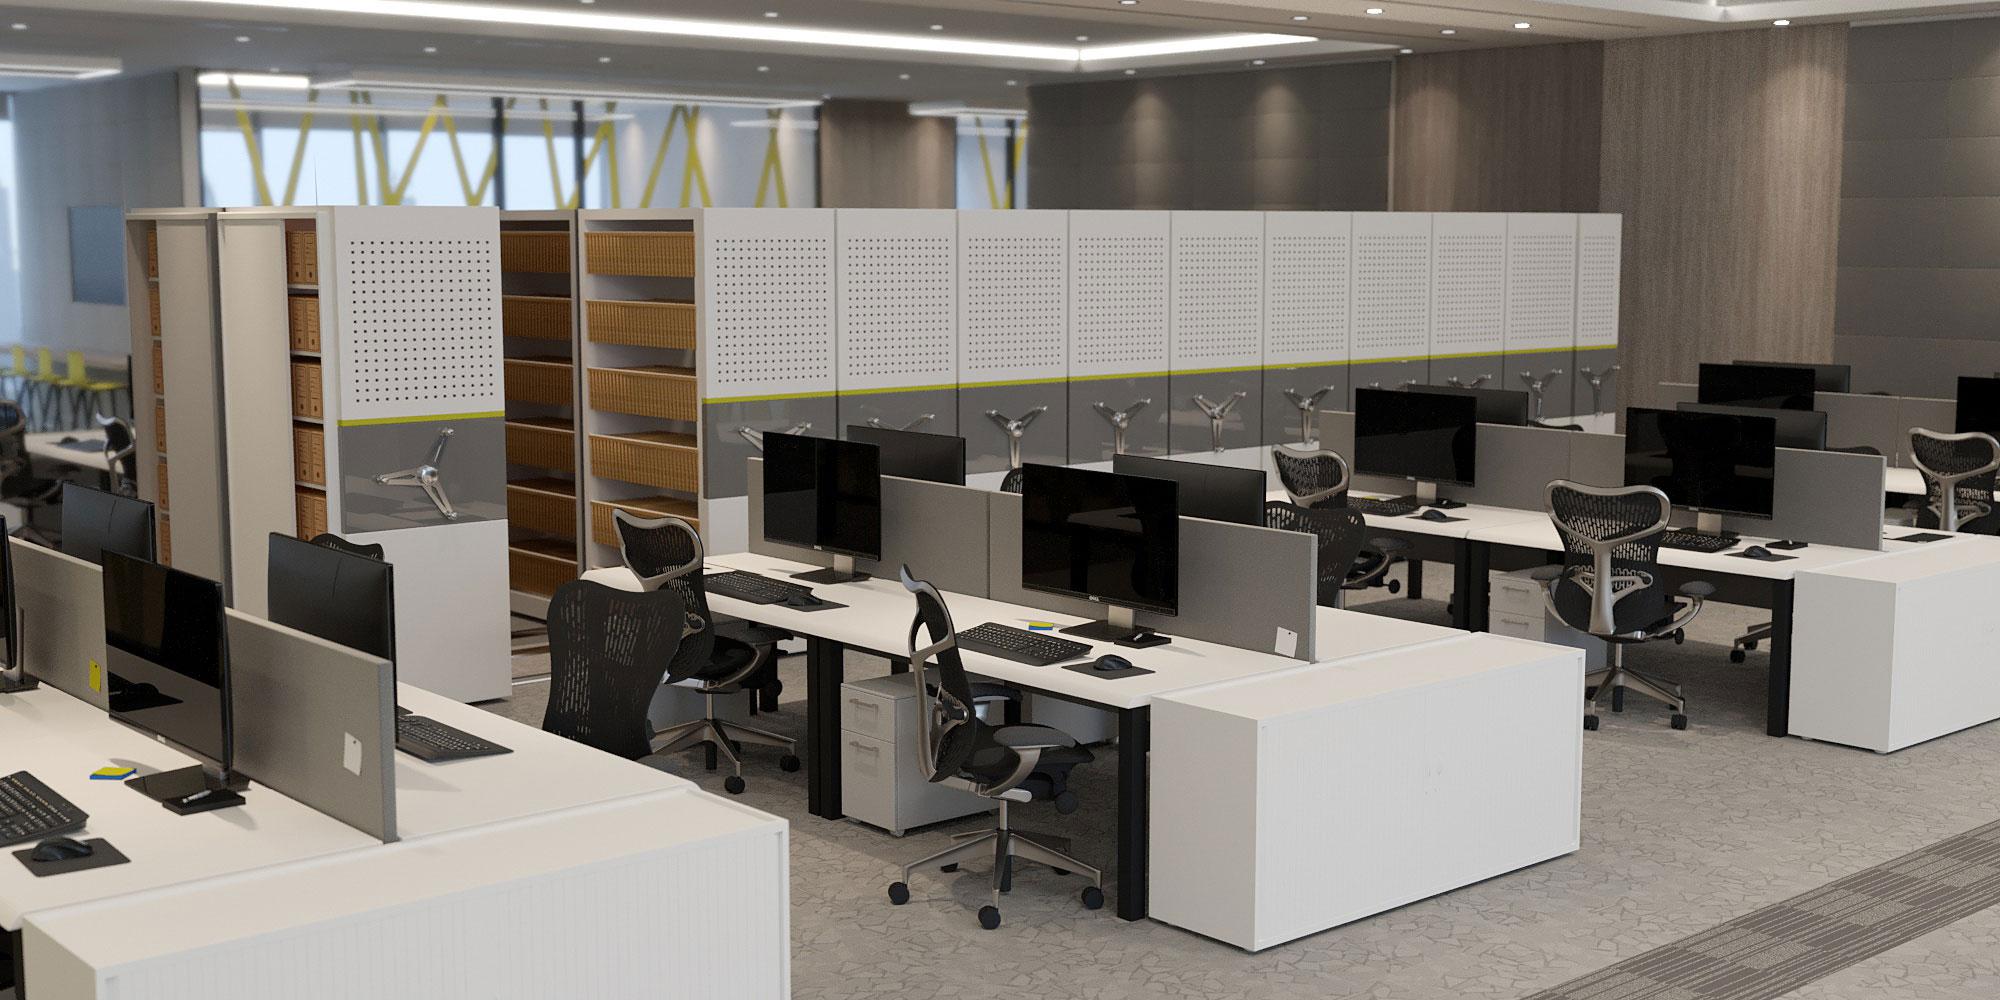 Arquivo-deslizante-Locus-Arquivos-escritorio